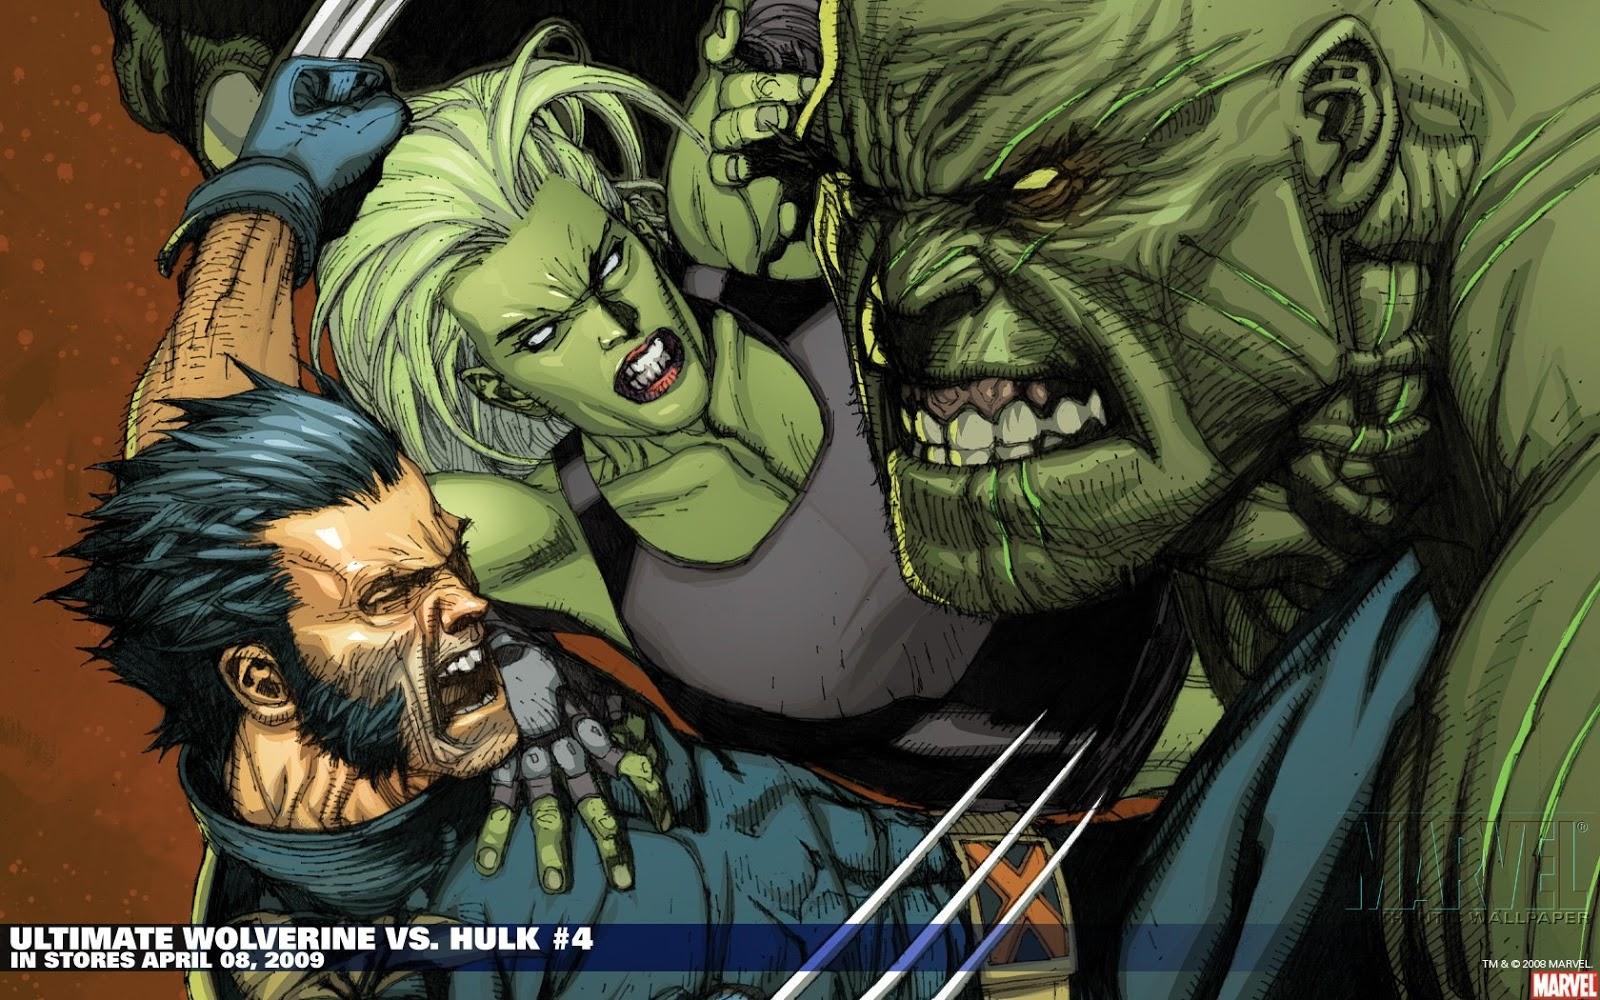 http://4.bp.blogspot.com/-Gl3F1T9oZ8Y/UMVG-7Bzd_I/AAAAAAAAQWg/hxEiTiserlg/s1600/marvel+wallpaper+super+heroehulk-comic-character-wolverine-she-hulk-marvel-comics-comic-.jpg